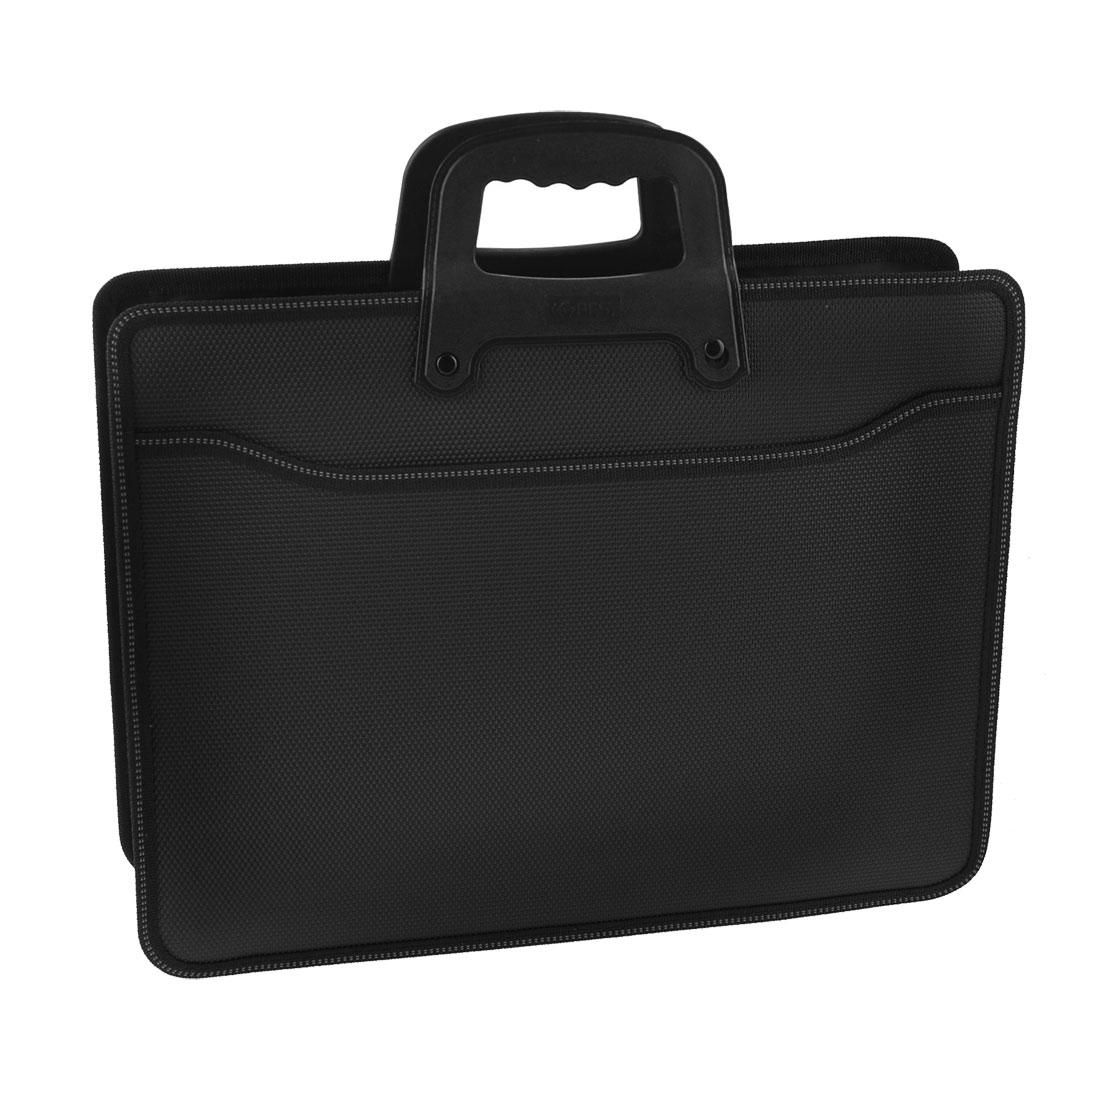 Portable Black 3 Compartments Zipper Closure File Bag Document Holder